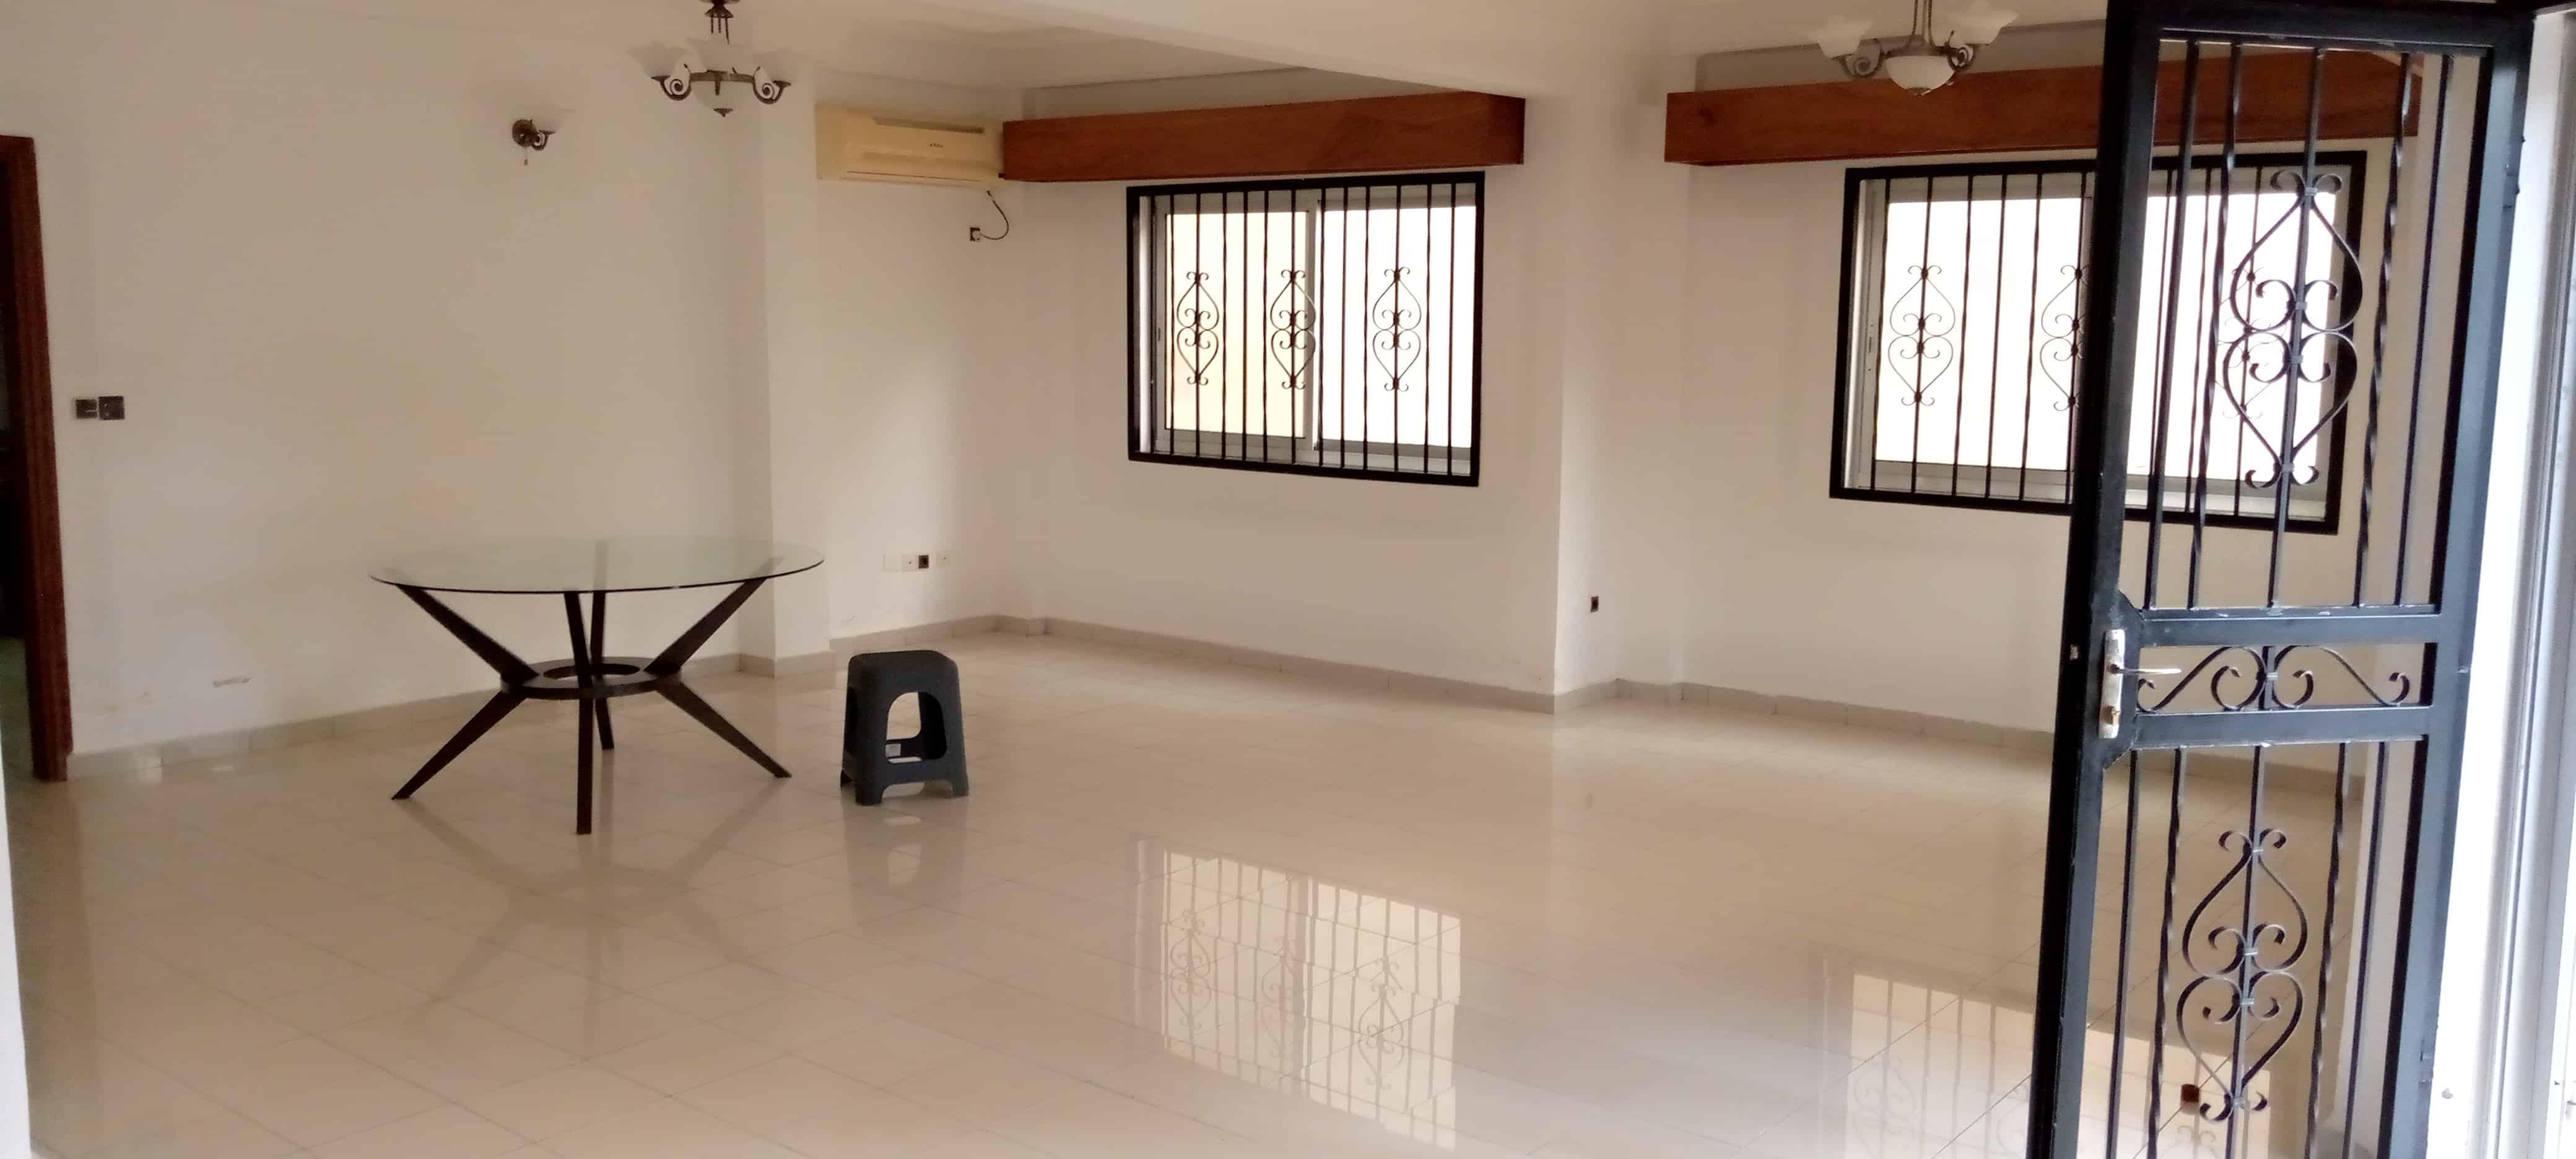 Apartment to rent - Yaoundé, Bastos, Golf - 1 living room(s), 2 bedroom(s), 3 bathroom(s) - 800 000 FCFA / month